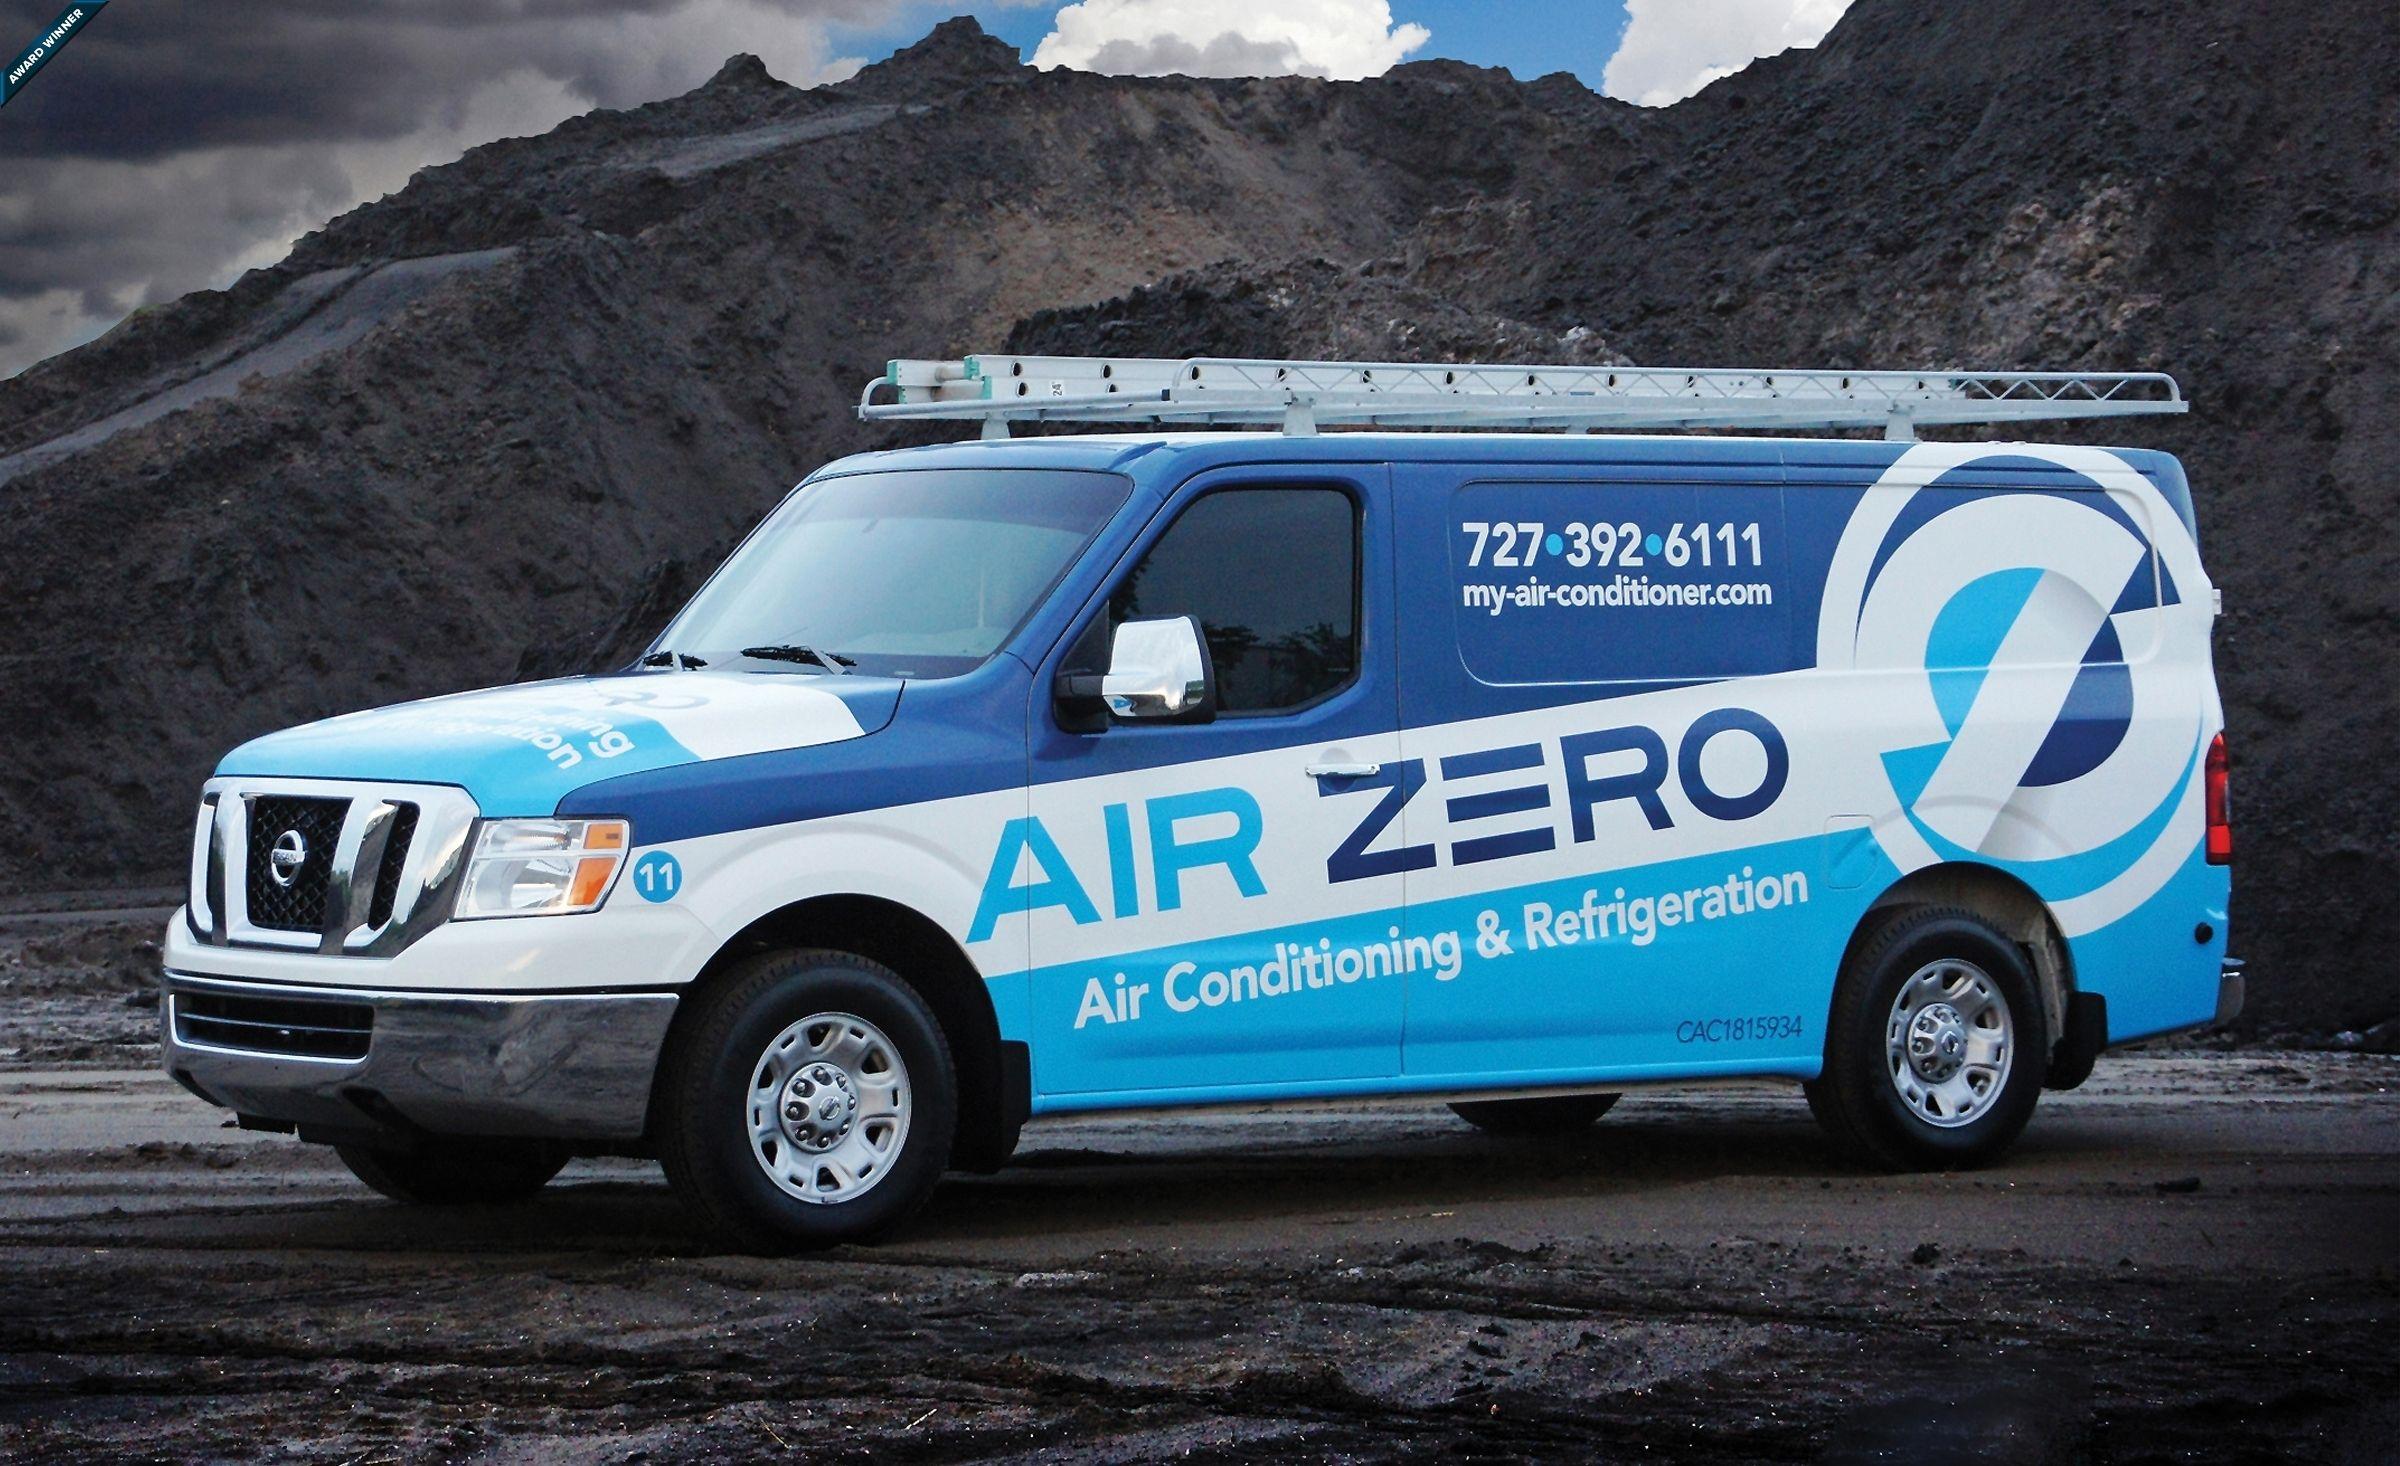 Simple car sticker design - Truck Wrap Design For Air Zero Nj Advertising Agency Nj Ad Agency Nj Web Design Nj Logo Design Website Design New Jersey Nj Graphic Designer